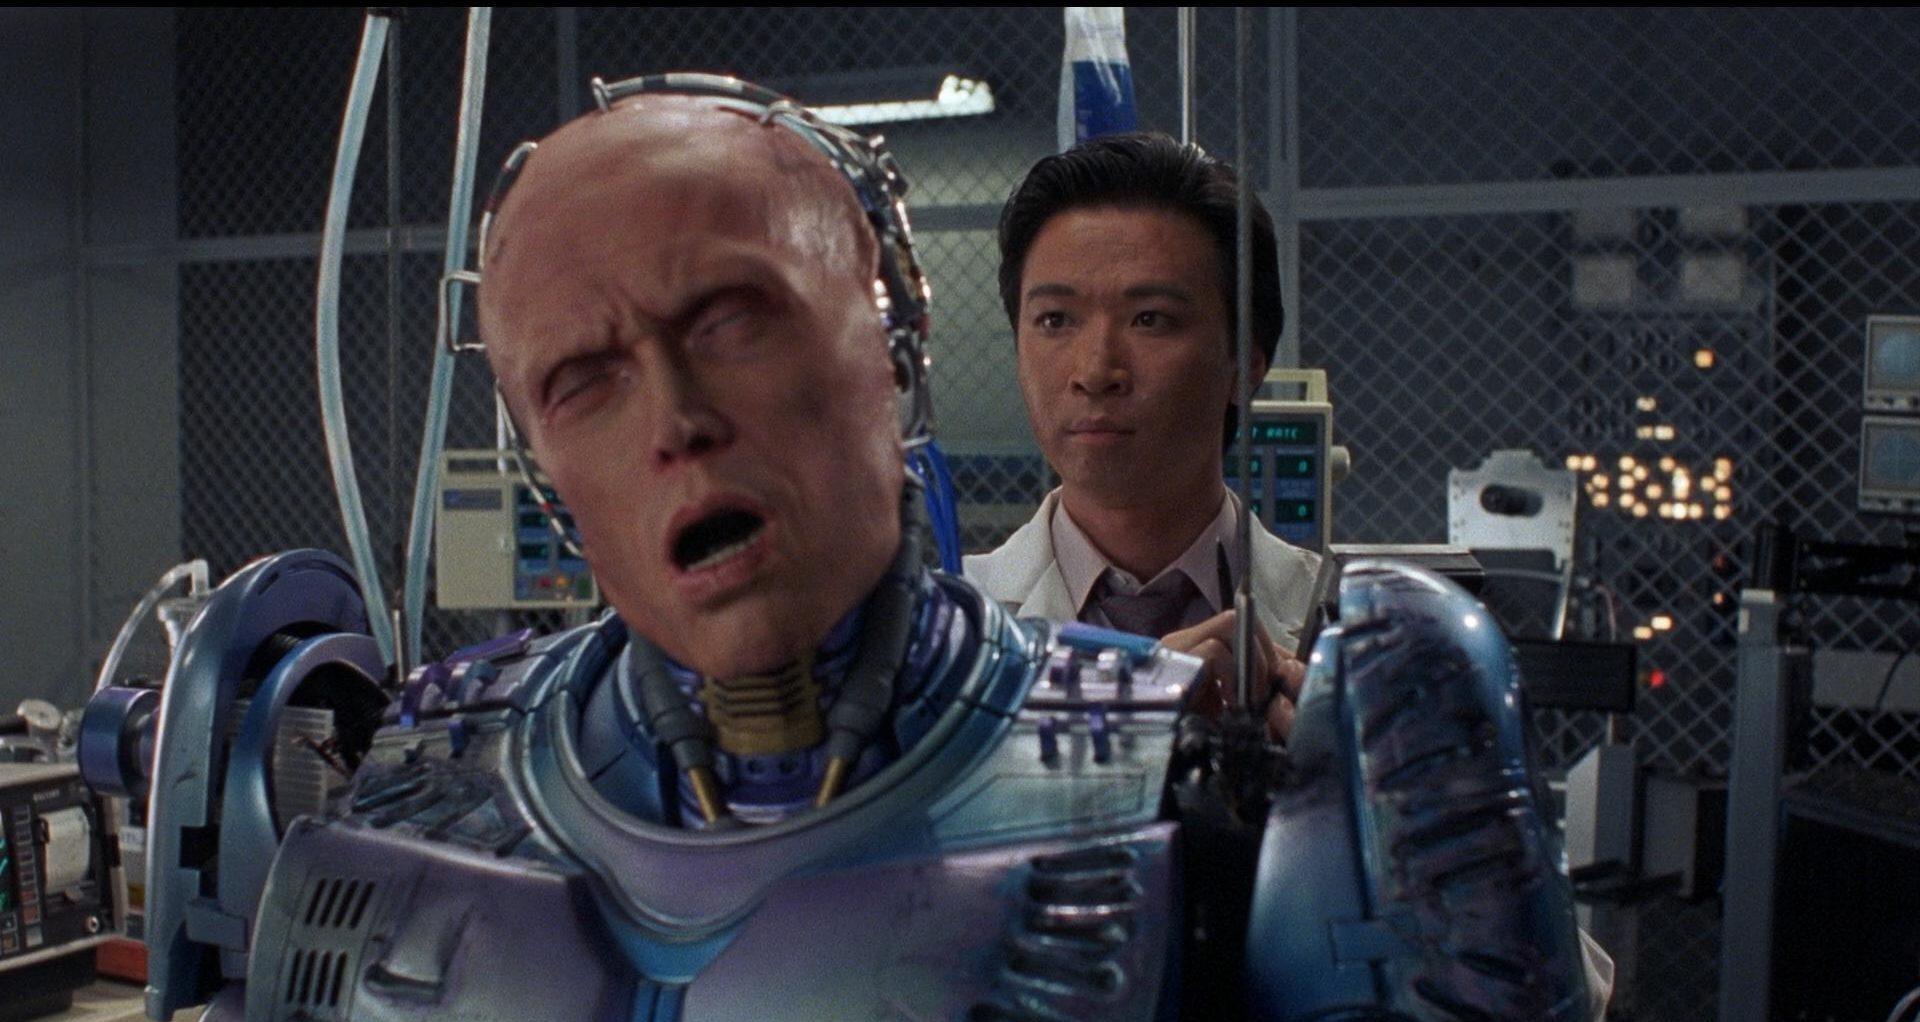 18a 1 e1609346296106 20 Futuristic Facts About RoboCop 2